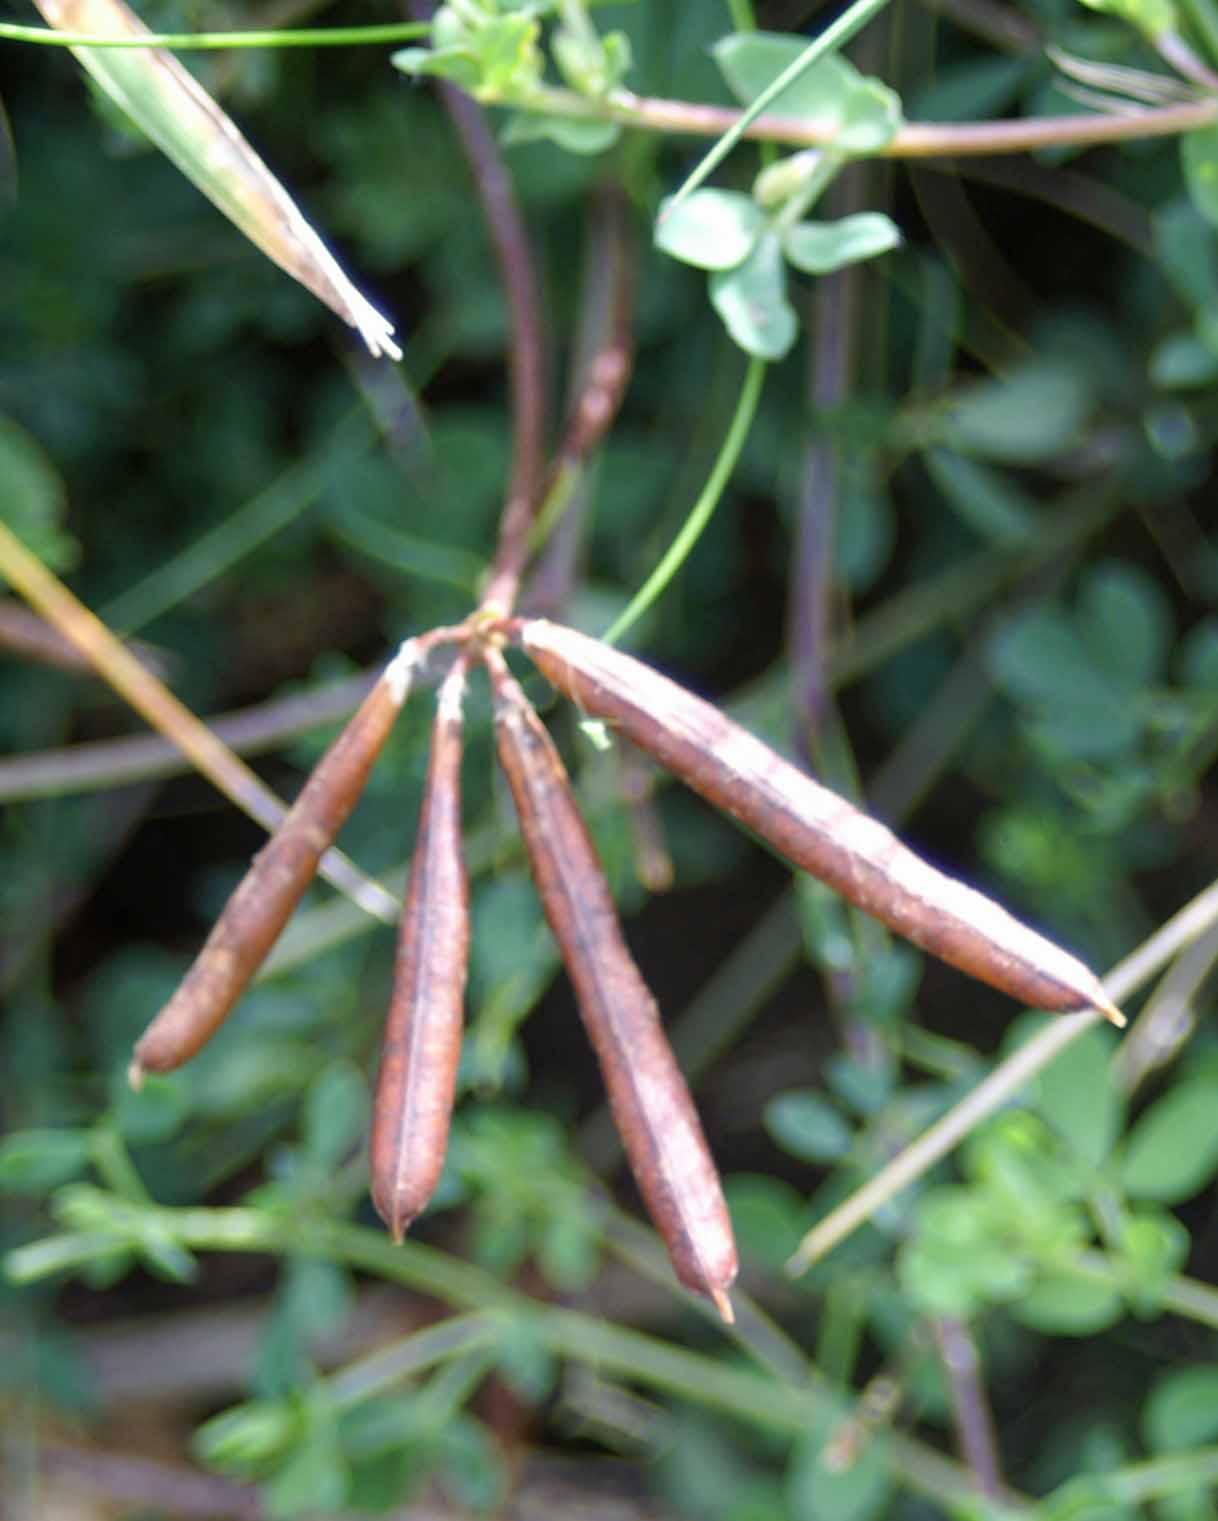 bird's foot trefoil seedpods | everyday nature trails